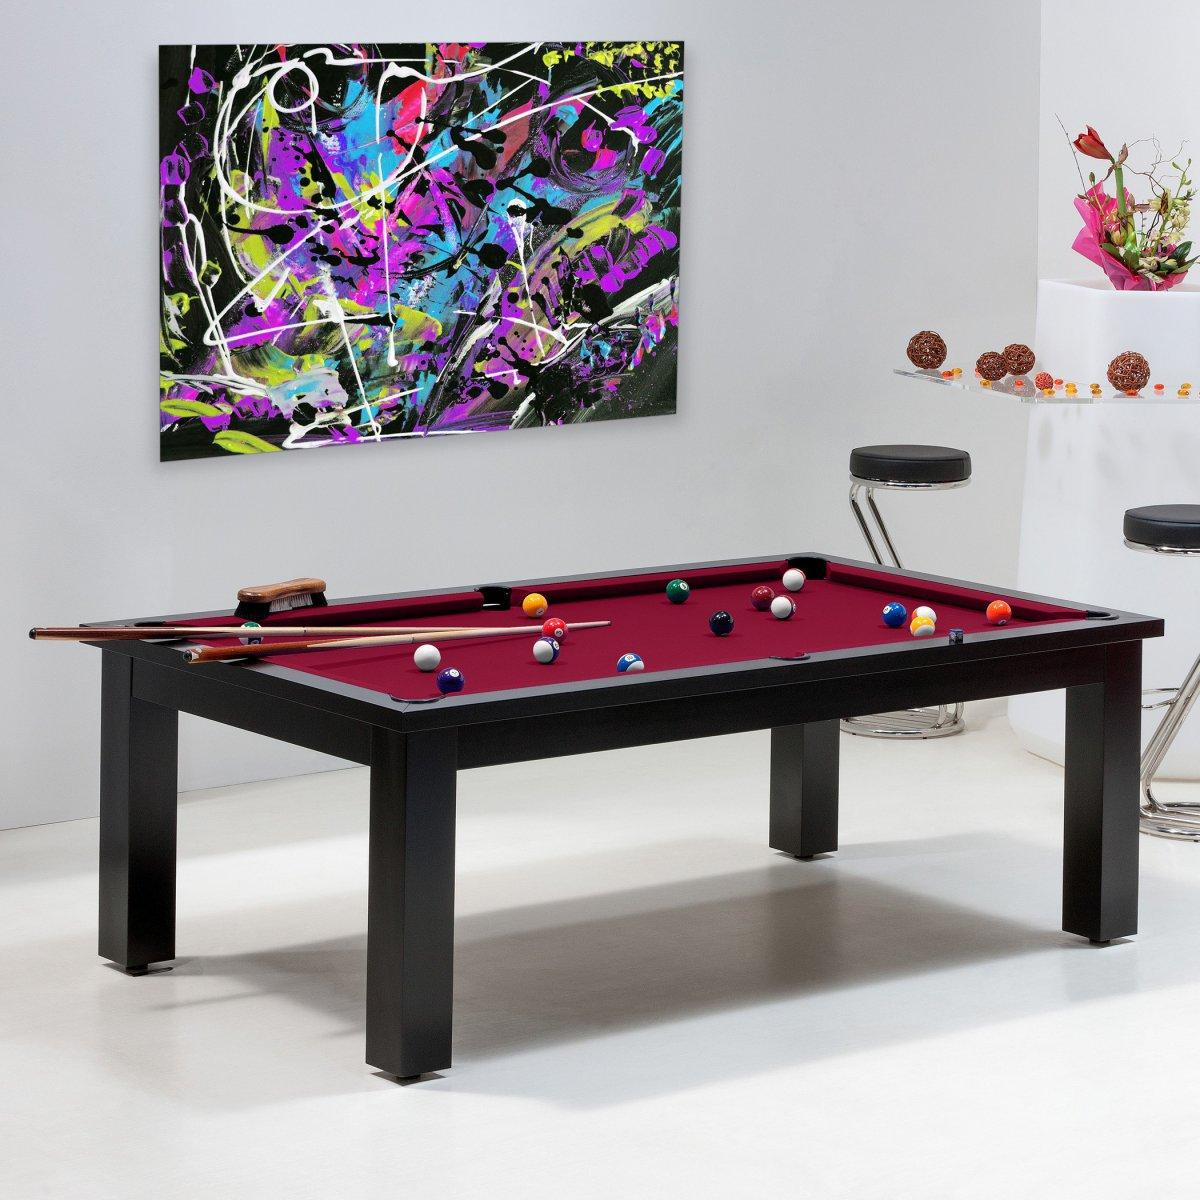 design  achat vente de billard table transformable en salon